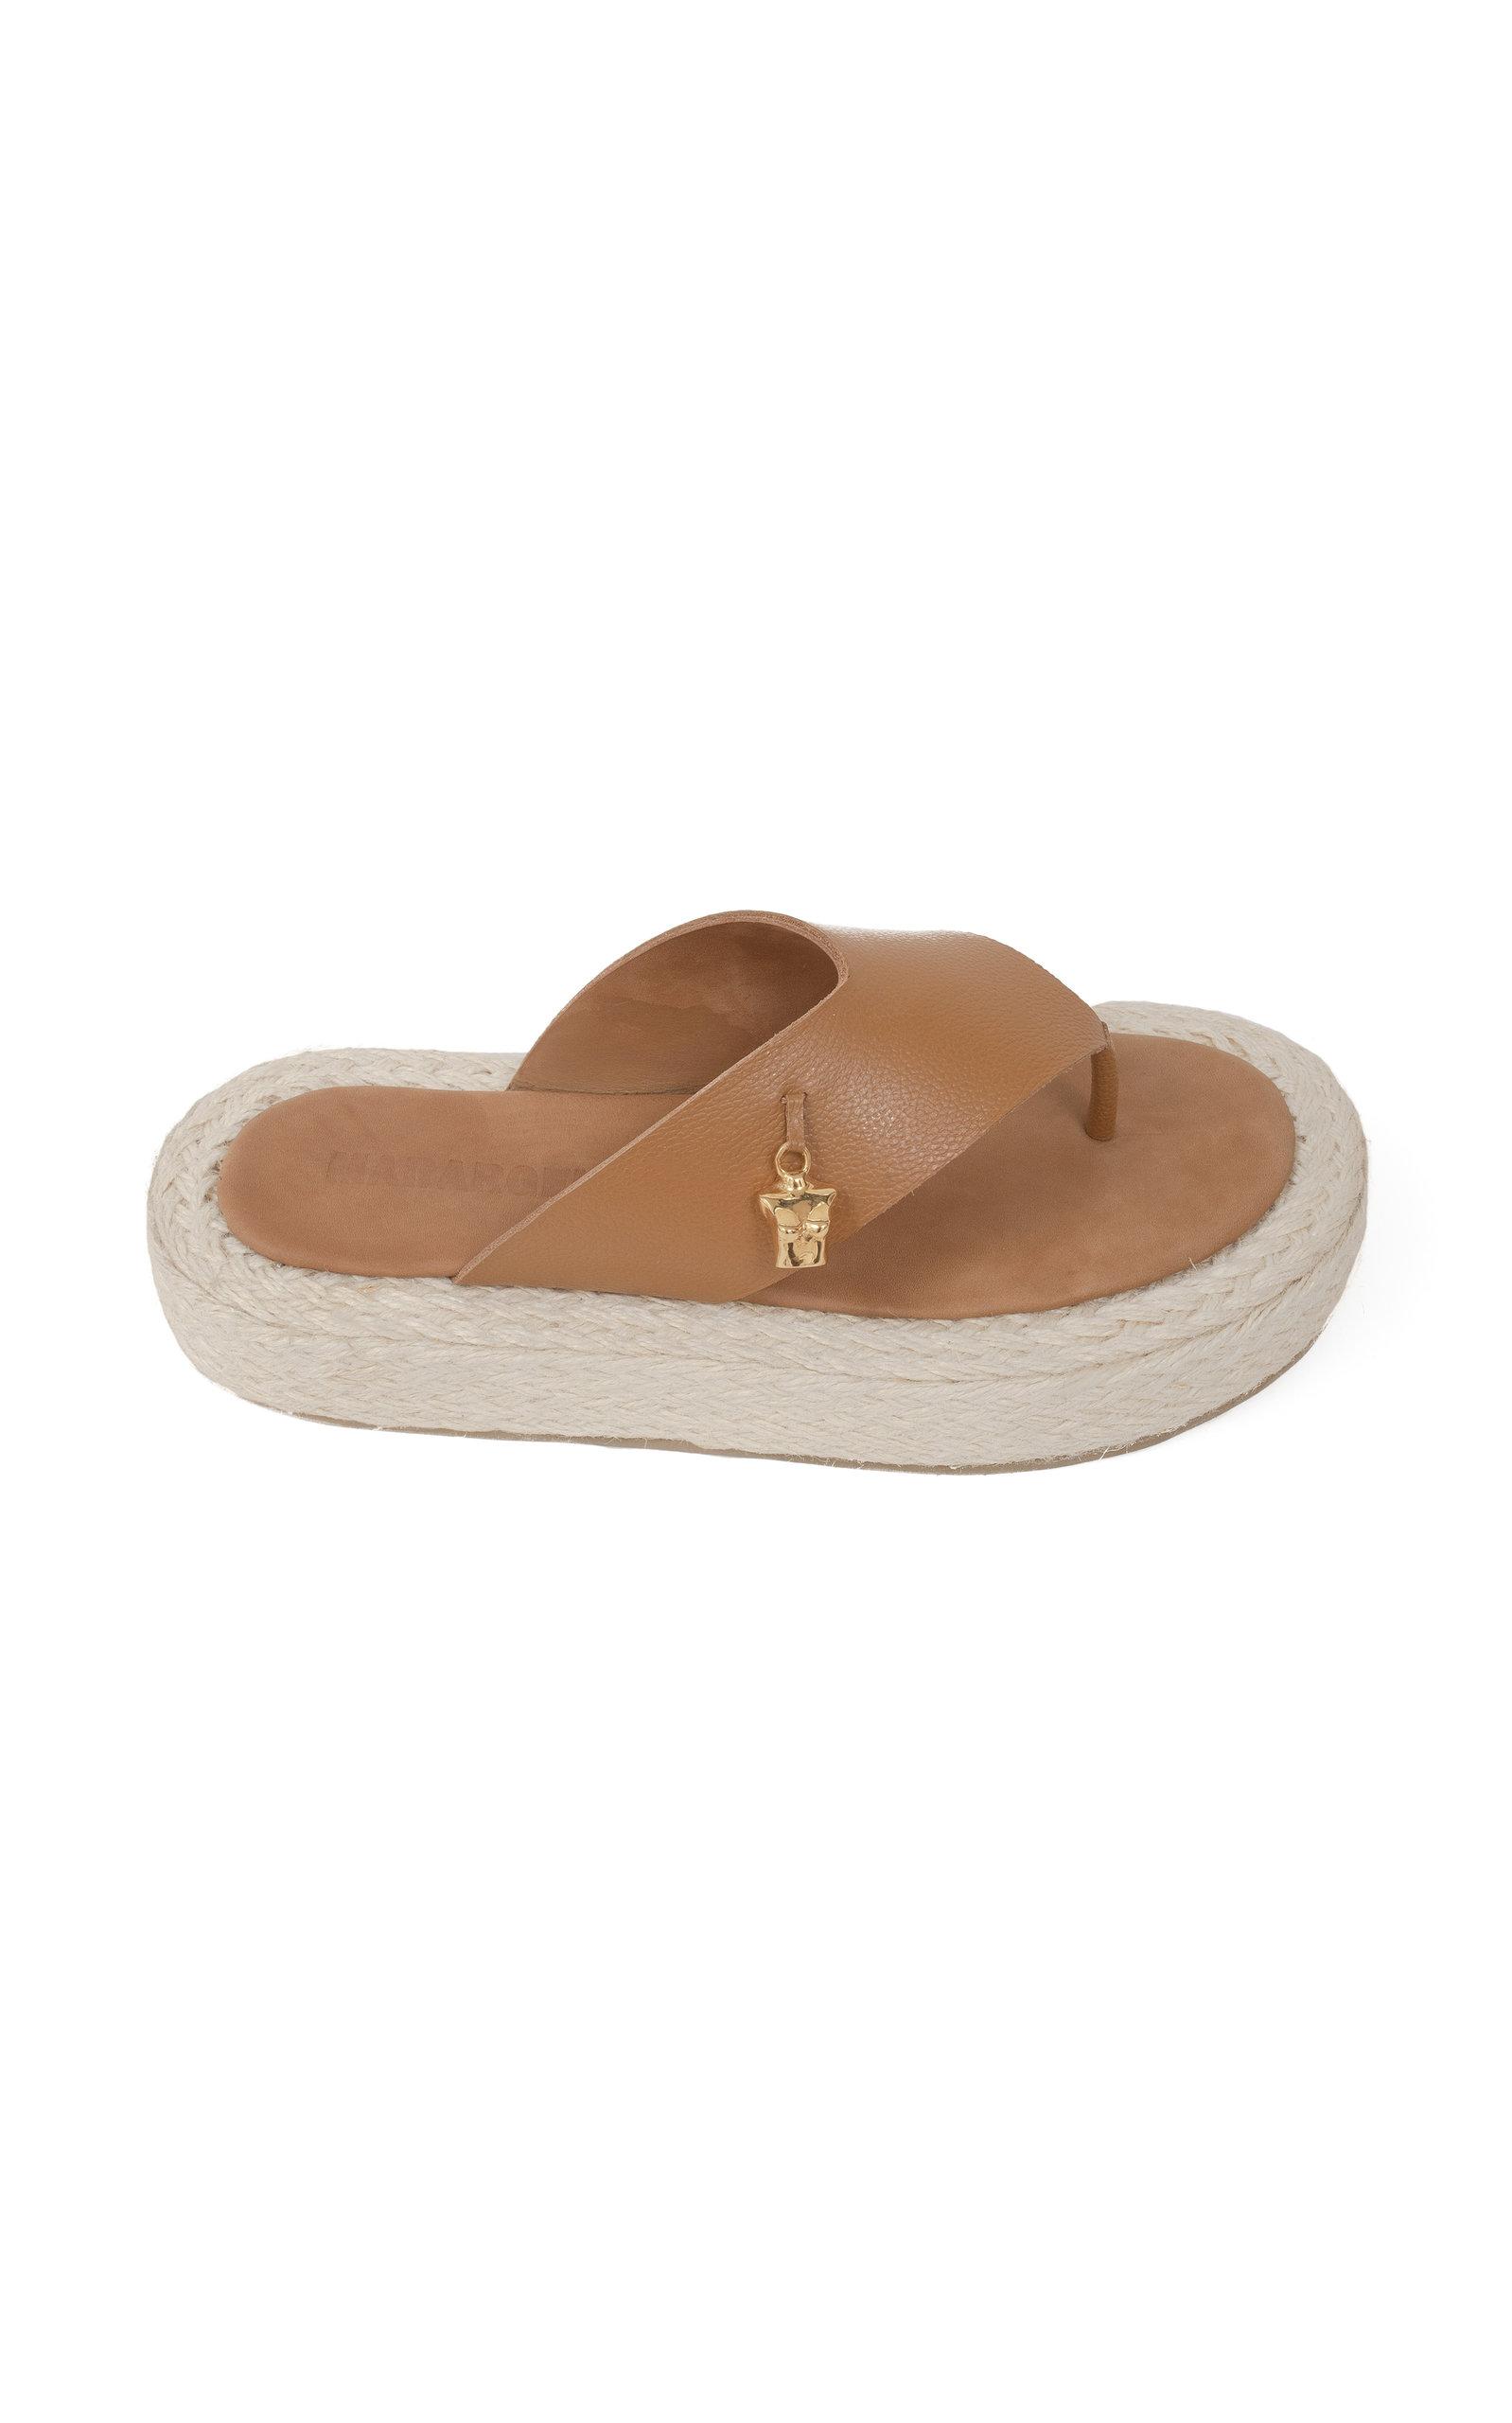 Women's Moda Exclusive: Raffia and Leather Sandals